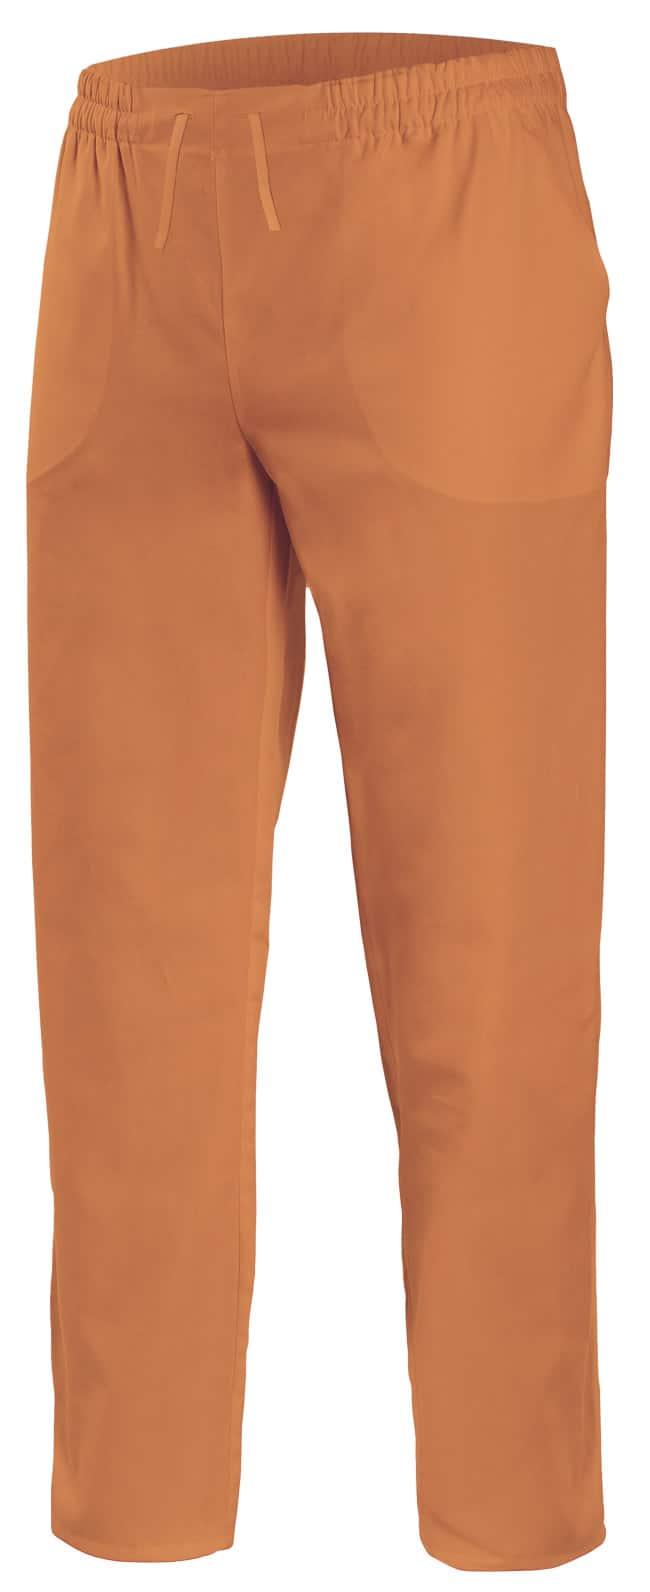 Velilla 533001 PantalÓn Pijama Con Cintas Naranja Claro